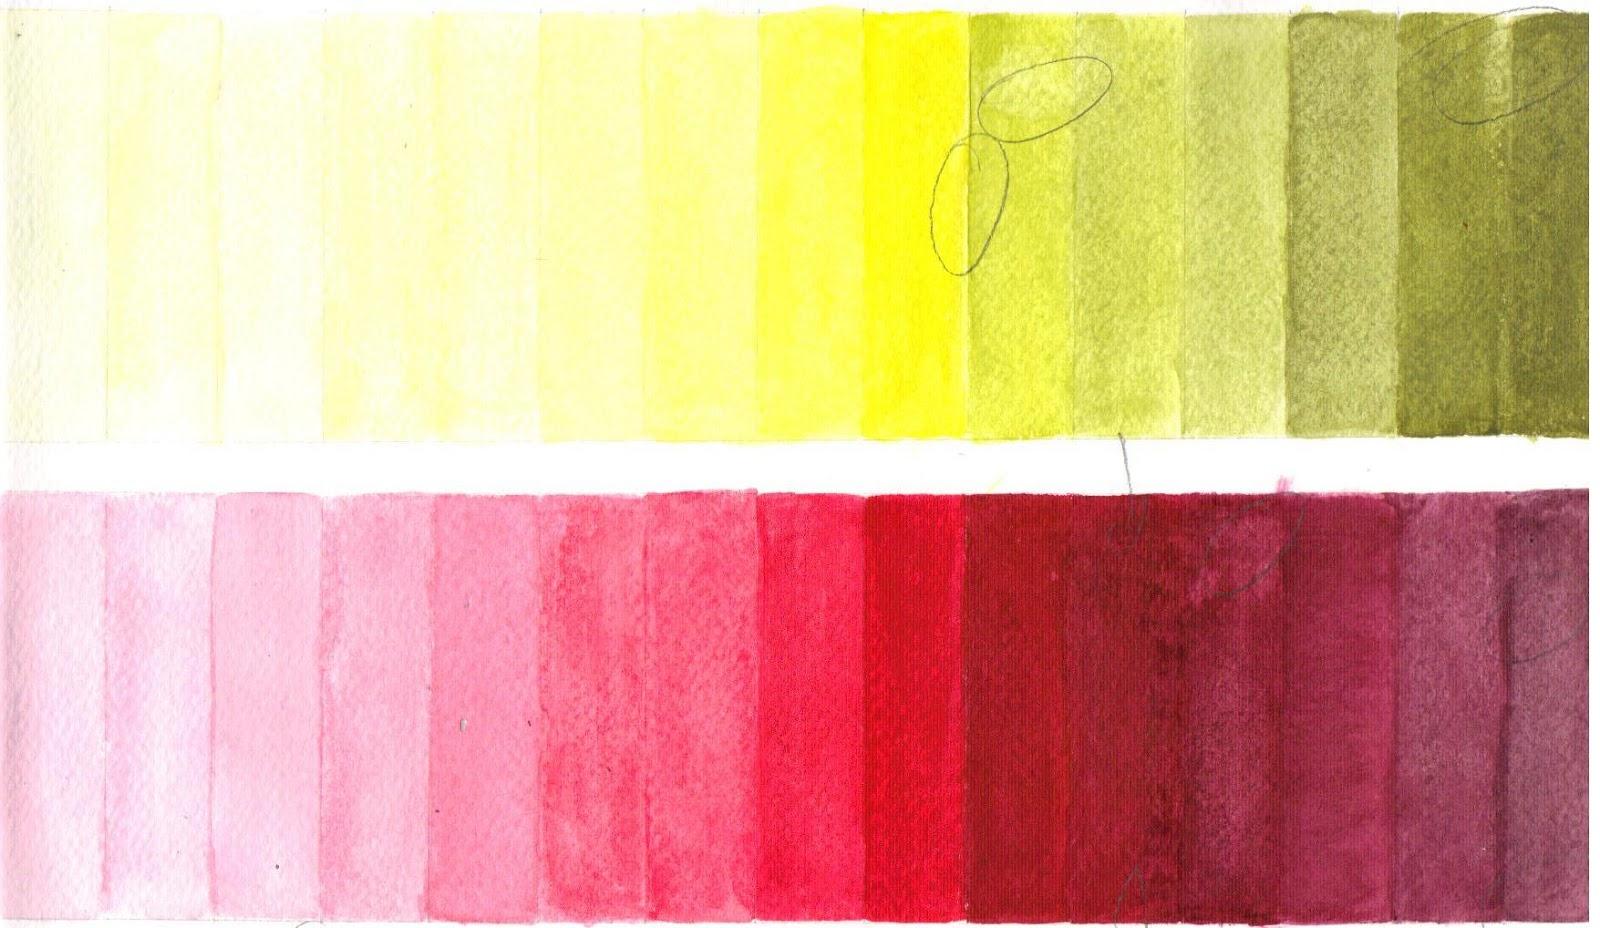 .: Escala Cromática Amarillo Rojo